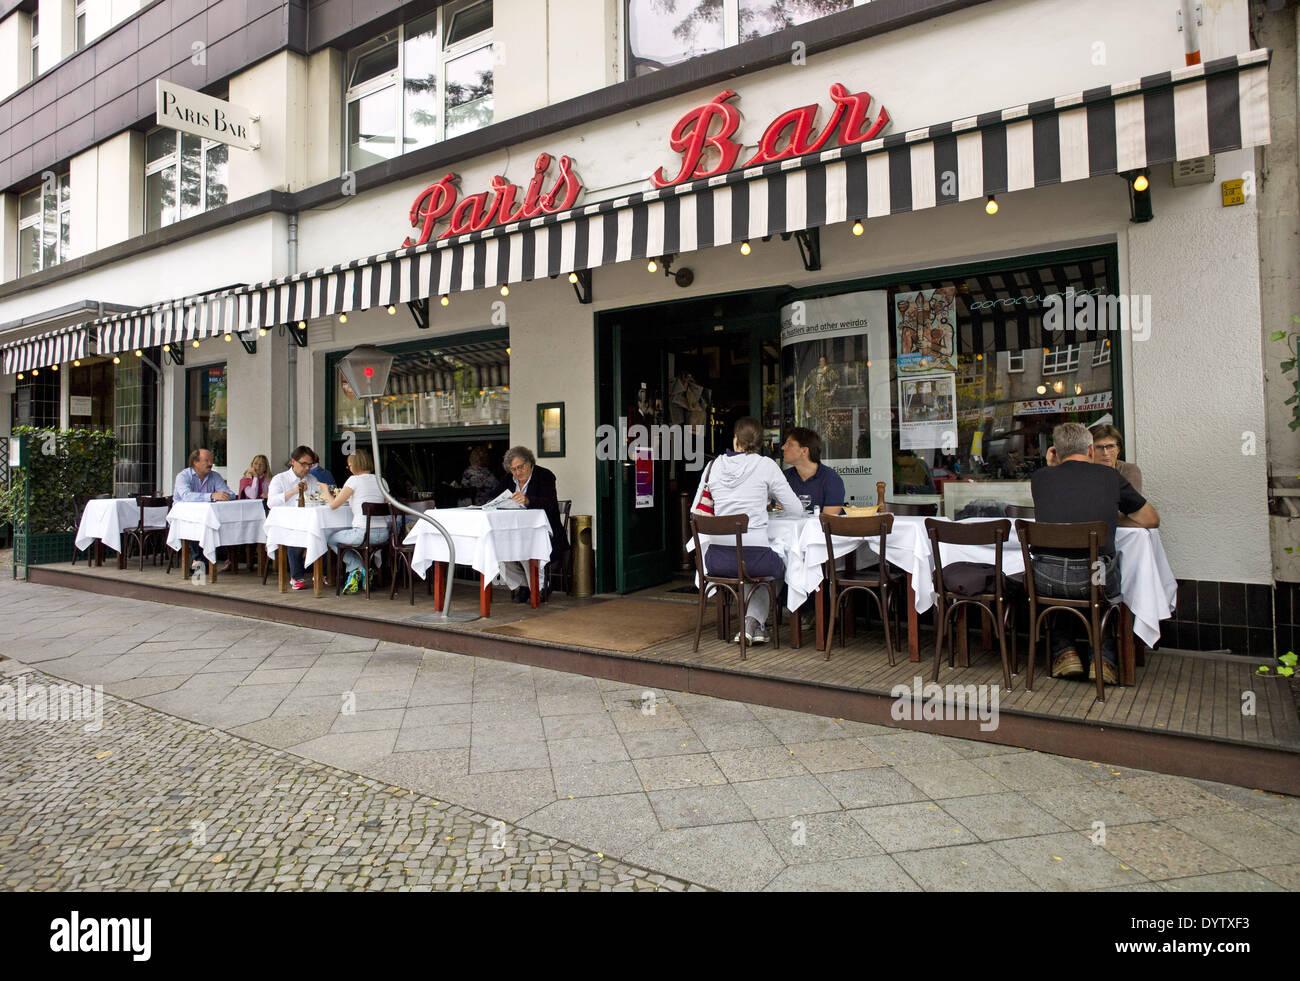 paris bar berlin stock photos paris bar berlin stock. Black Bedroom Furniture Sets. Home Design Ideas